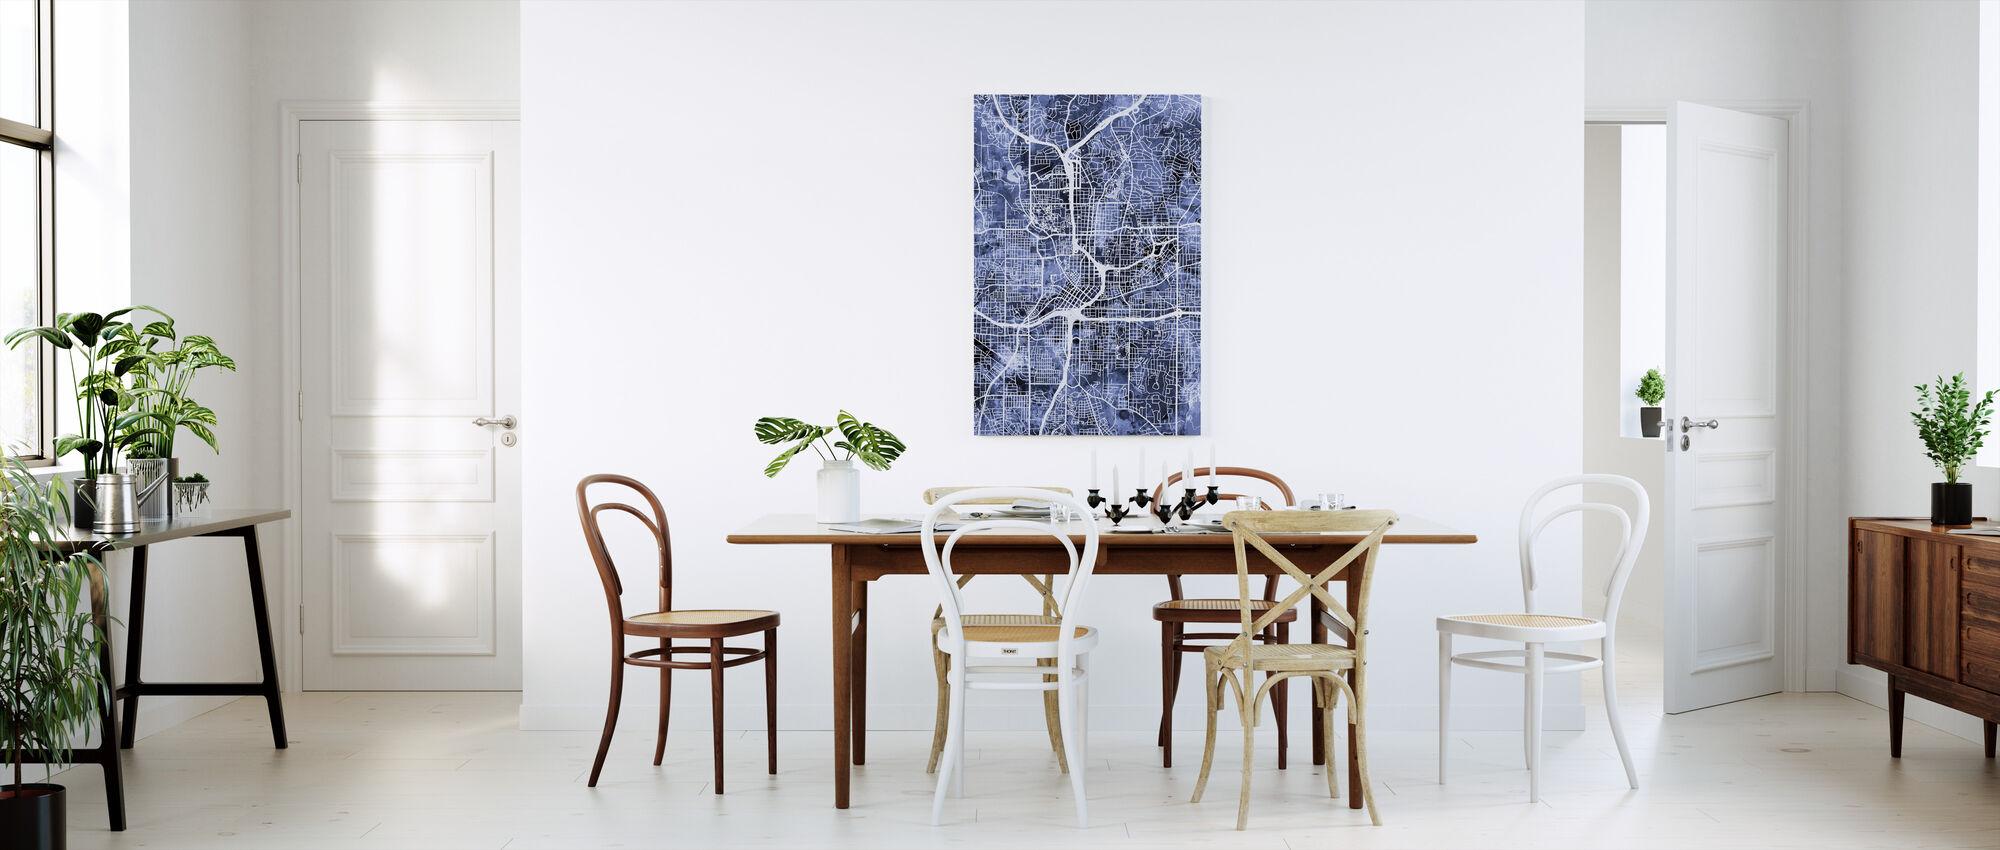 Atlanta Georgia City Map - Canvas print - Kitchen